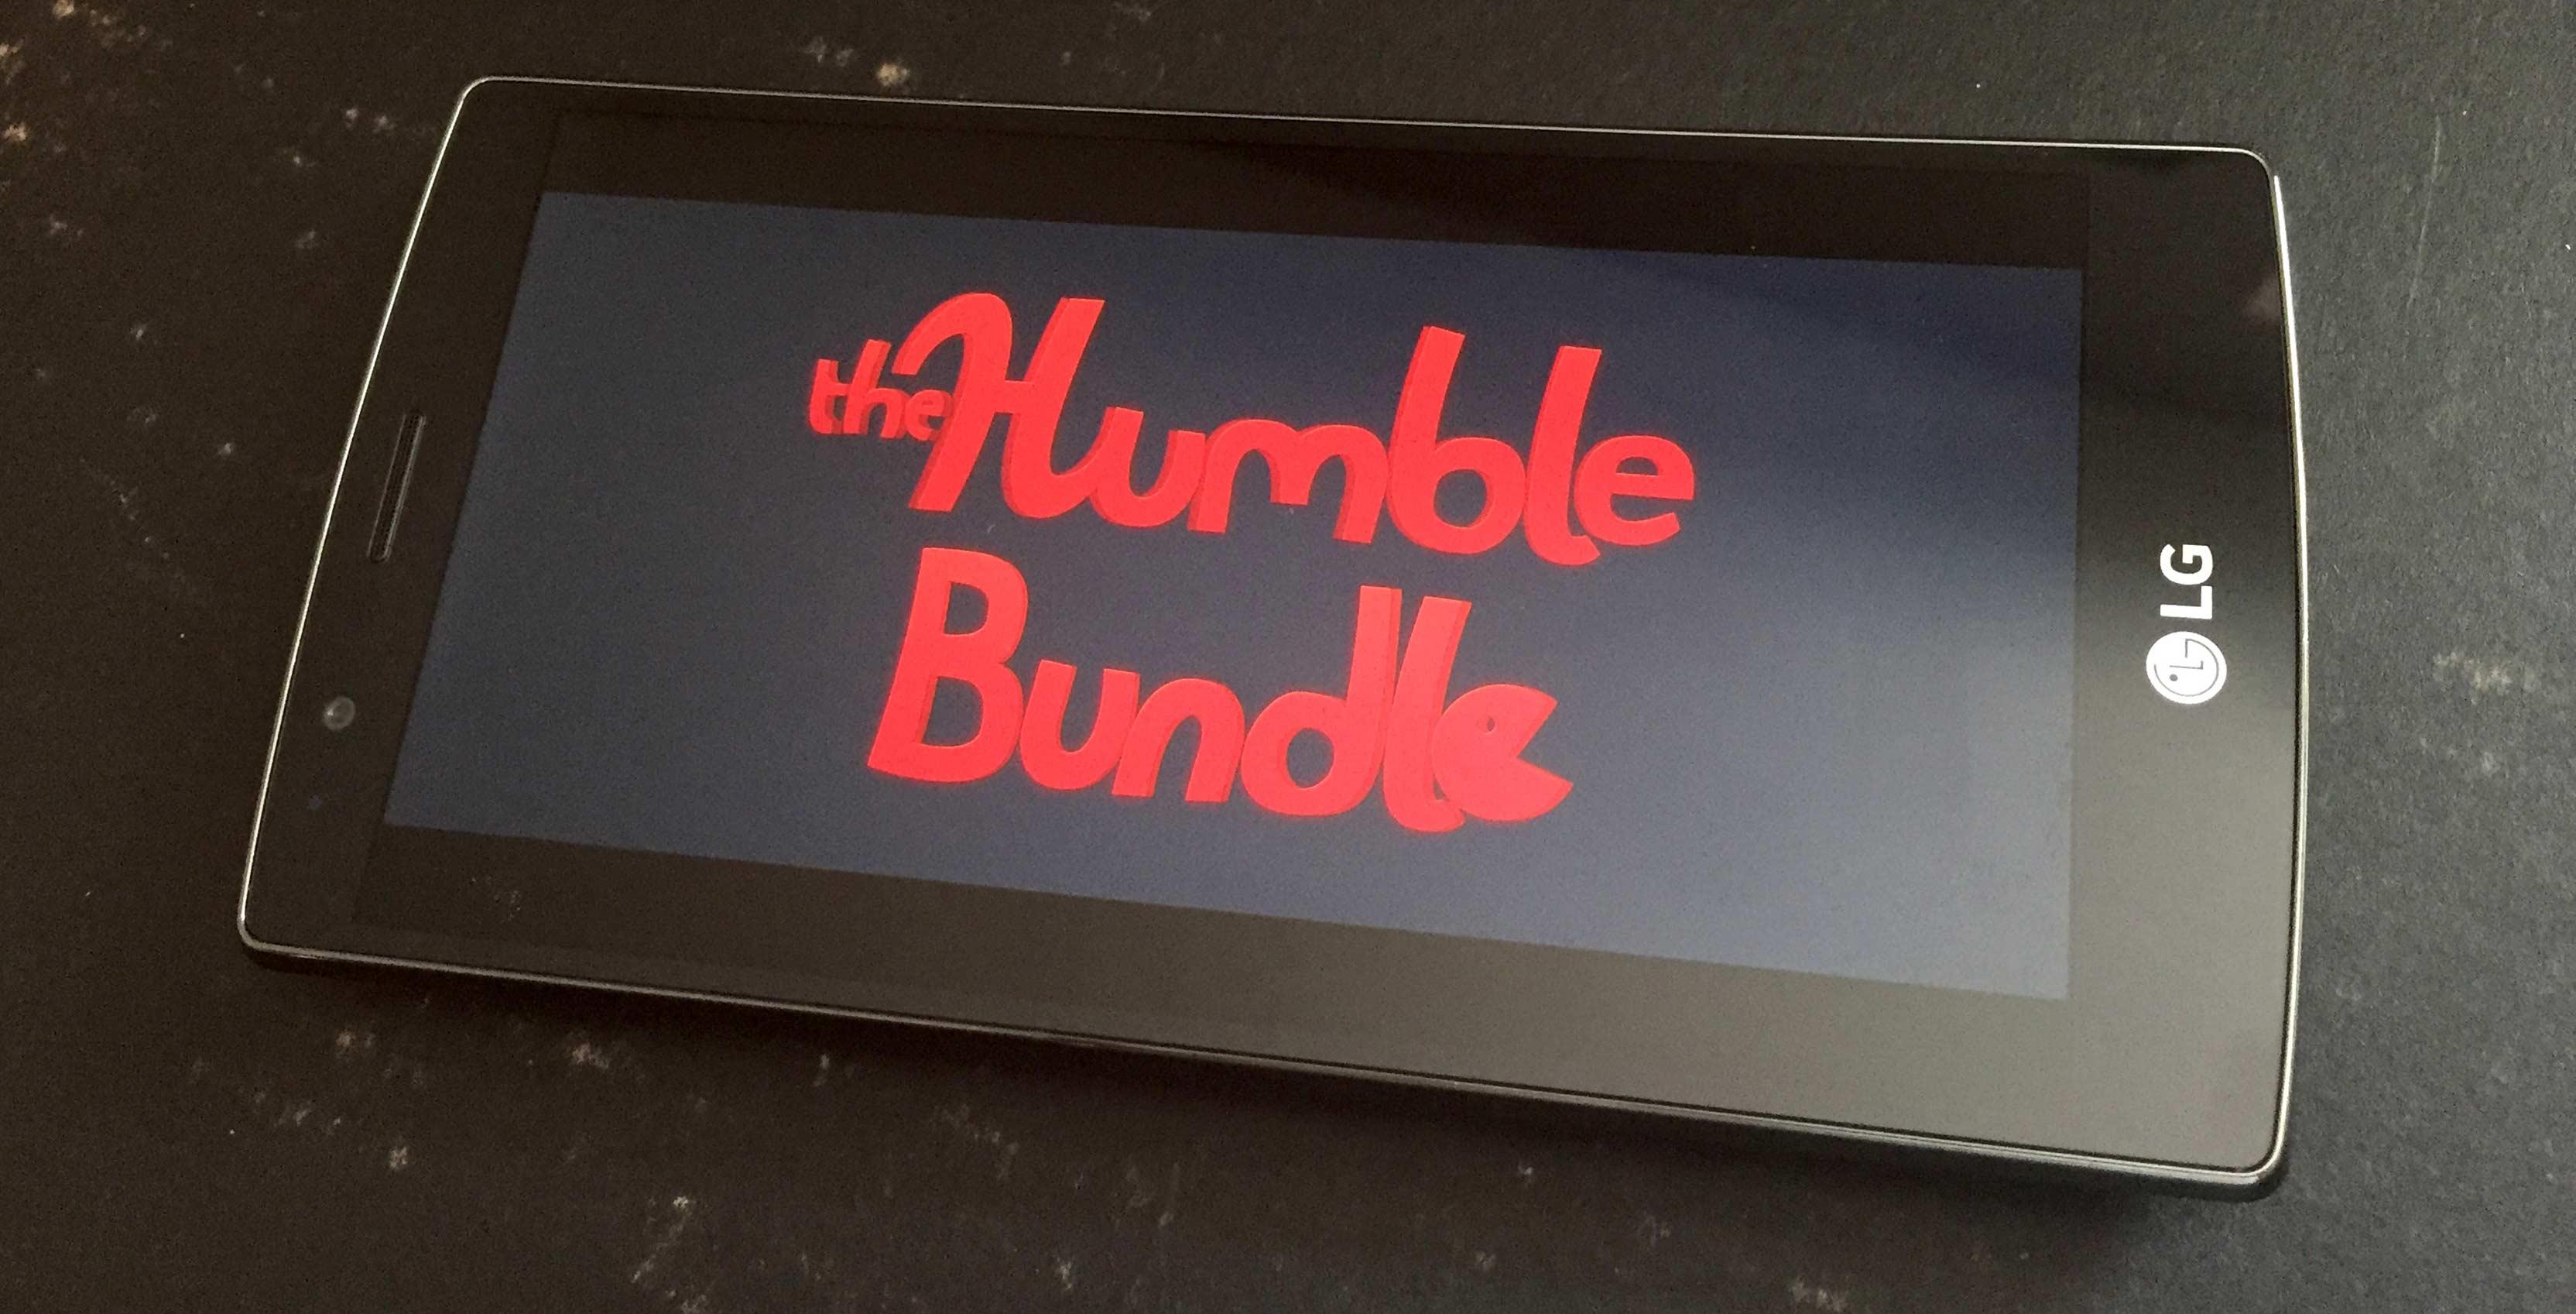 Humble Bundle on an LG phone